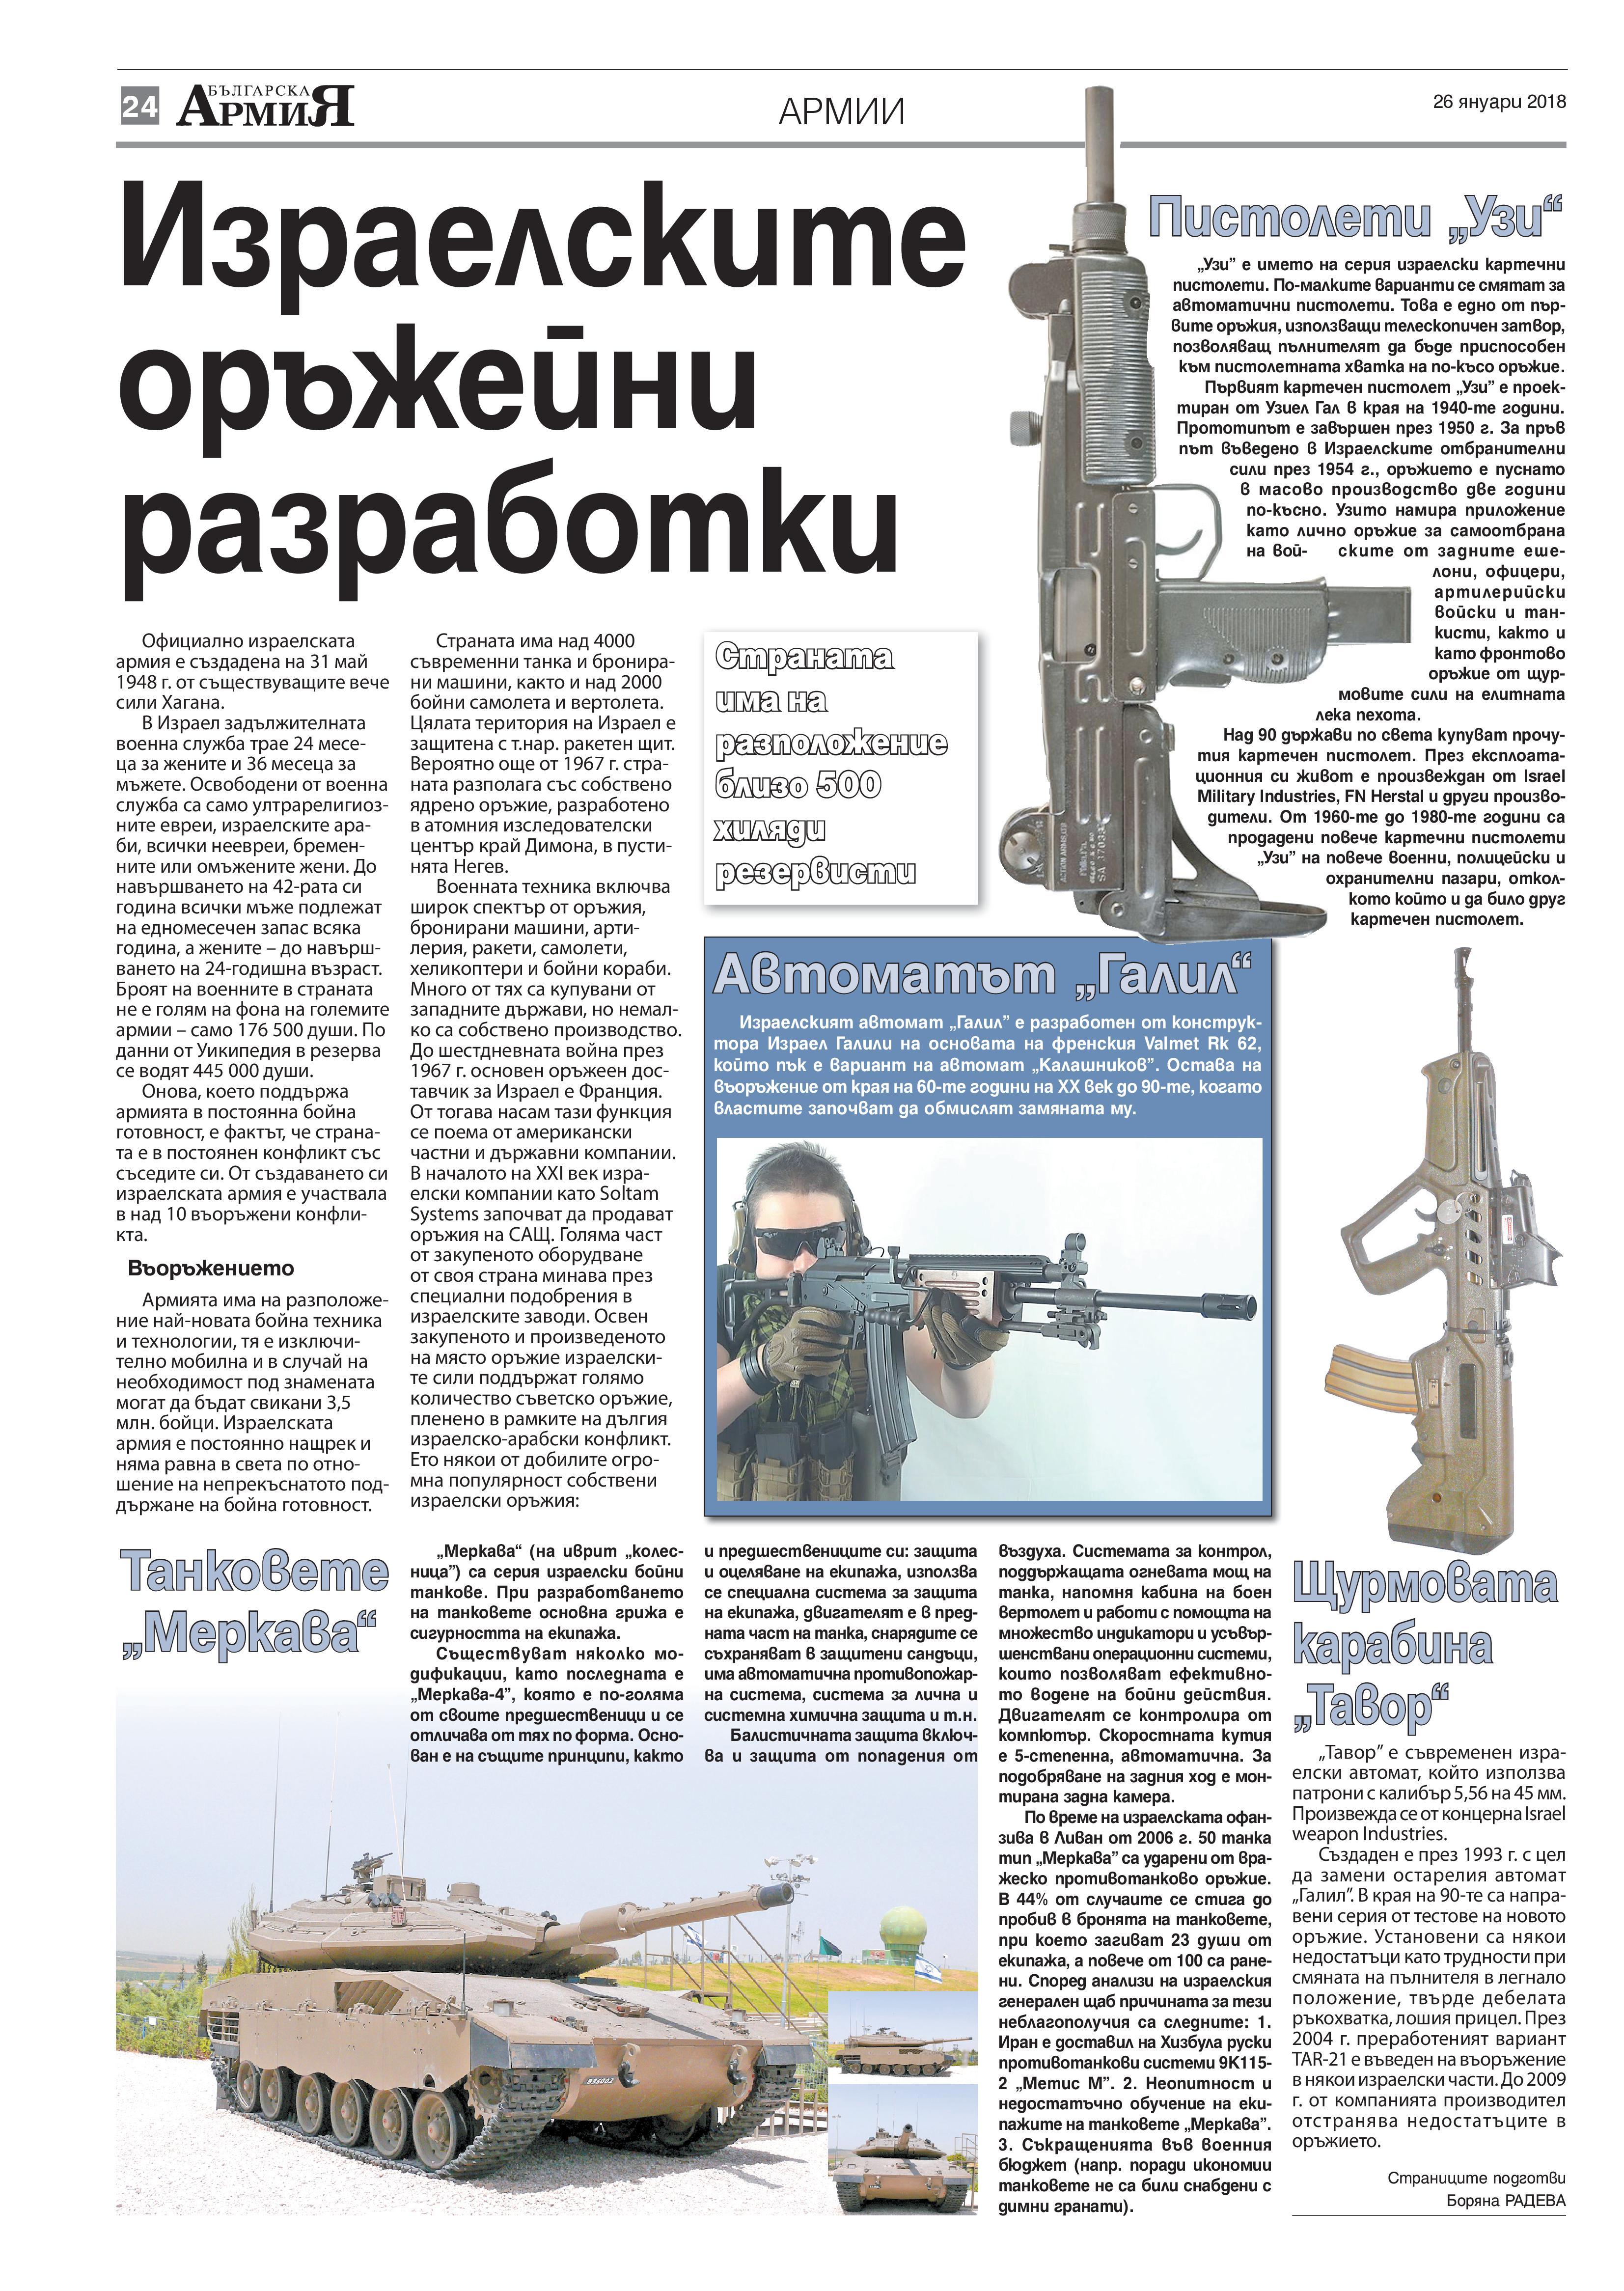 http://armymedia.bg/wp-content/uploads/2015/06/24-18.jpg